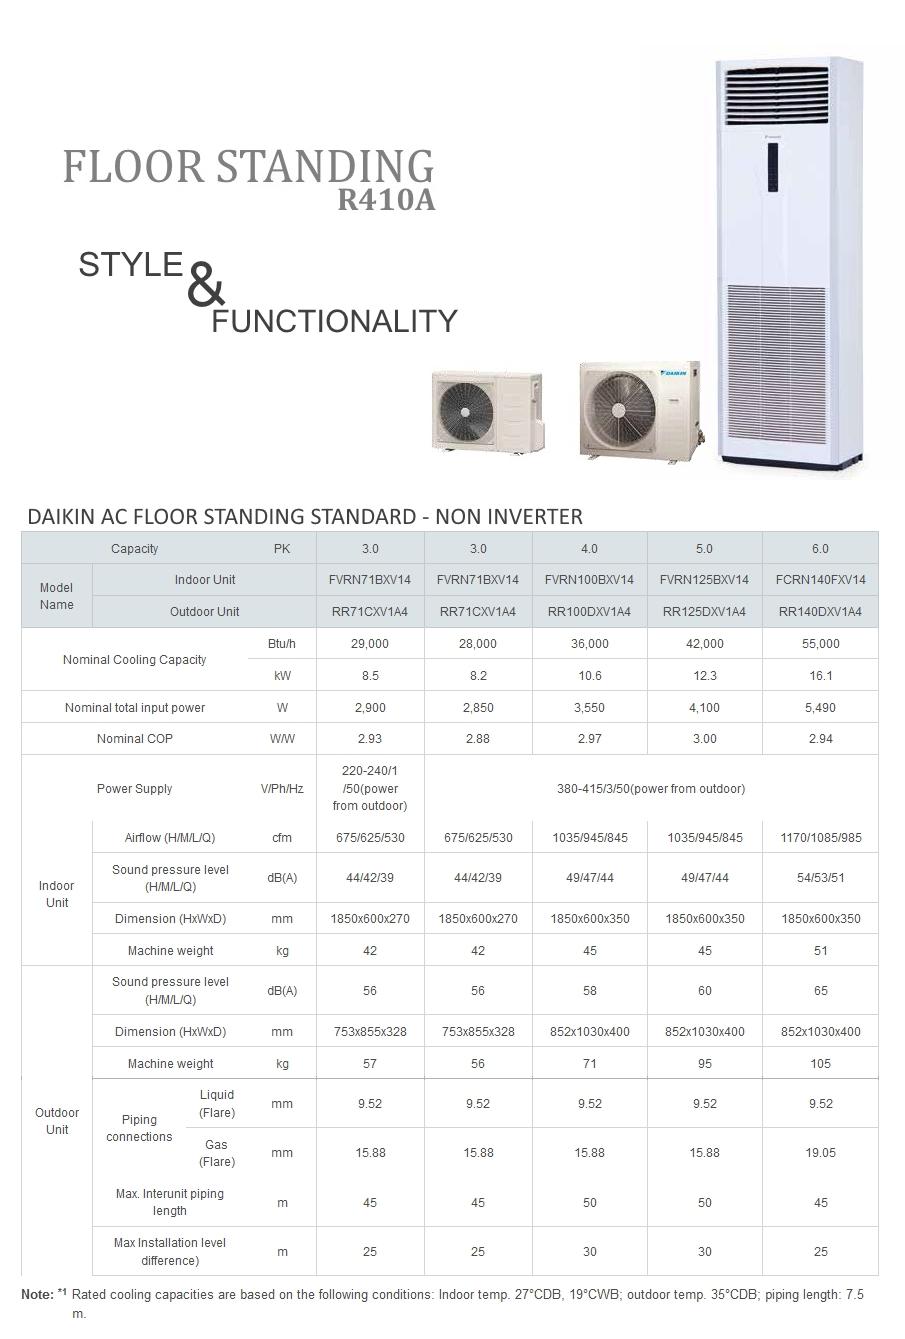 ac-daikin-floor-standing-non-inverter-ac-standing-daikin